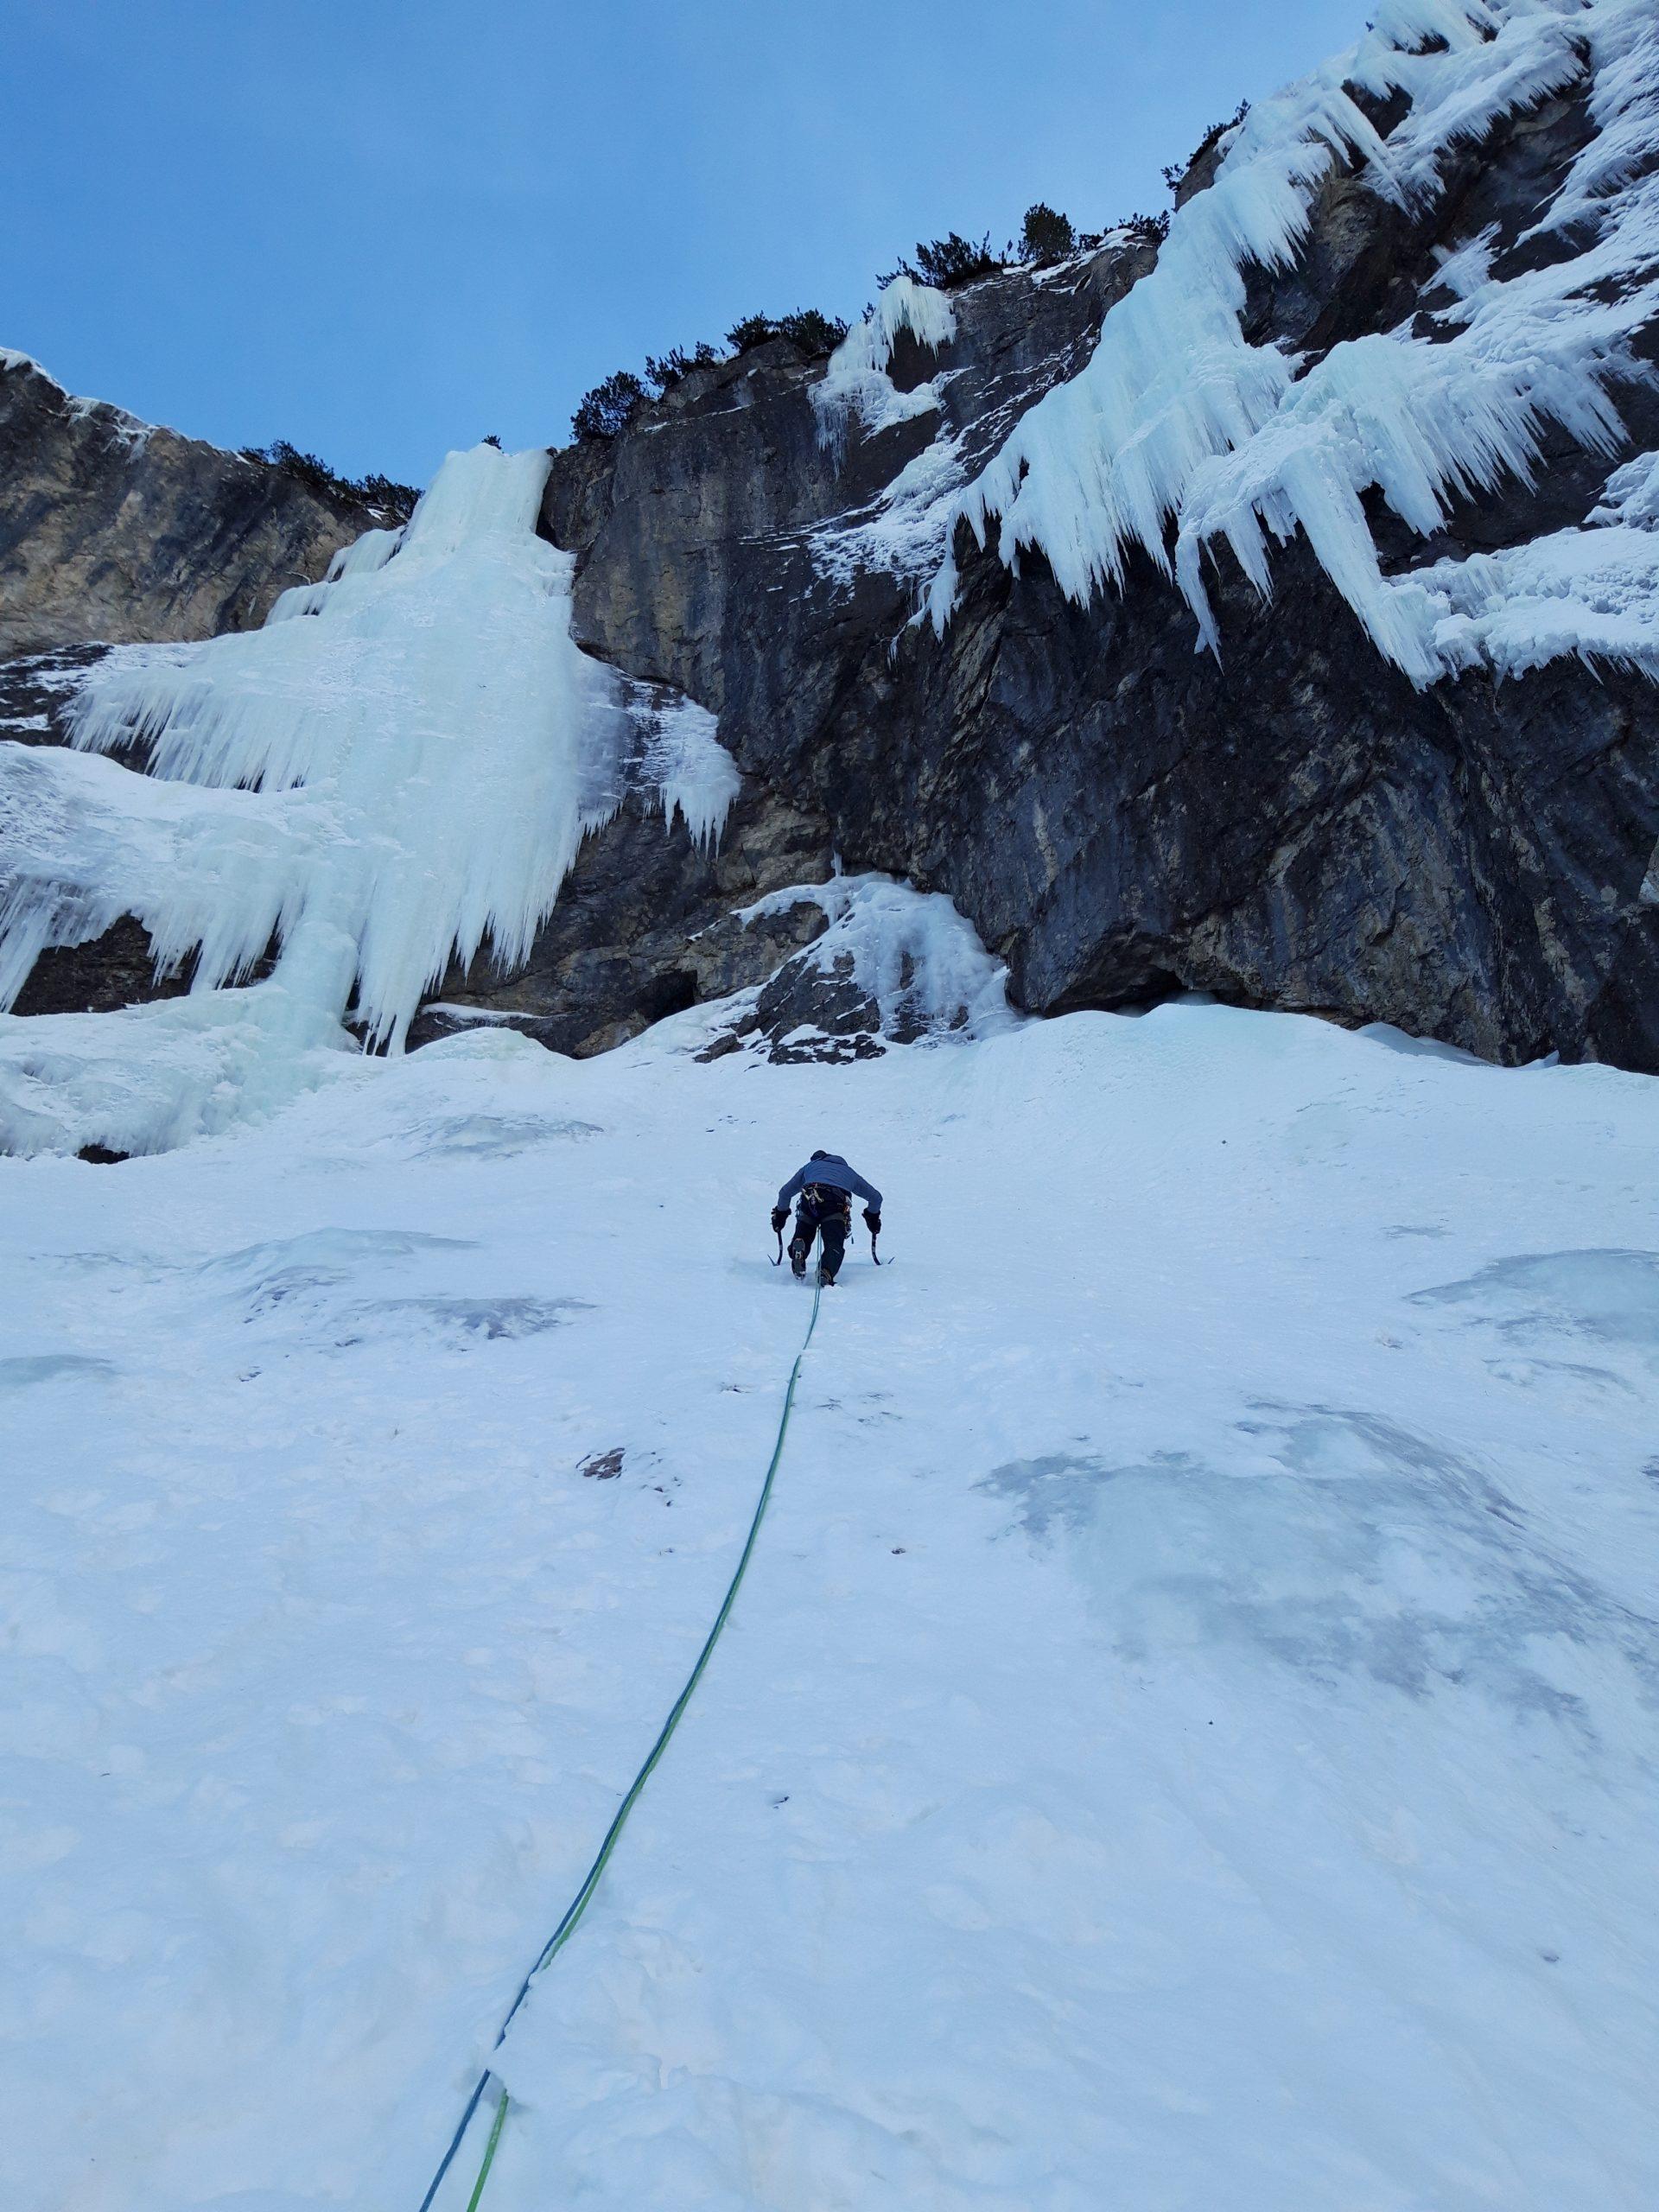 Eremit Zustieg Pinnistal (Stubai), Tirol. Foto: Simon Messner